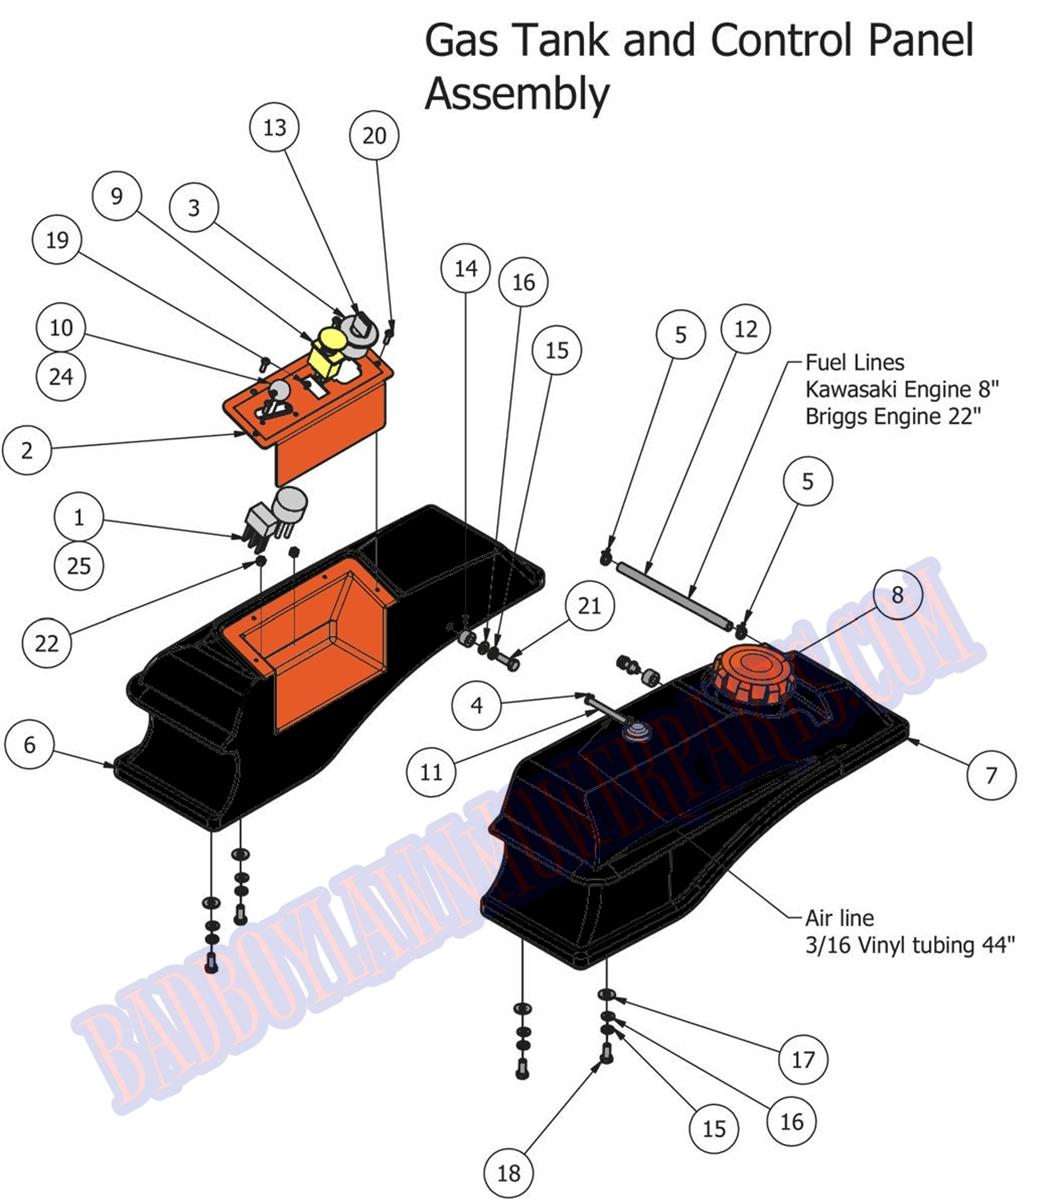 Bad Boy Mower Part, 2013 MZ FUEL TANK & CONTROL PANEL Bad Boy Mower Wiring Diagram on